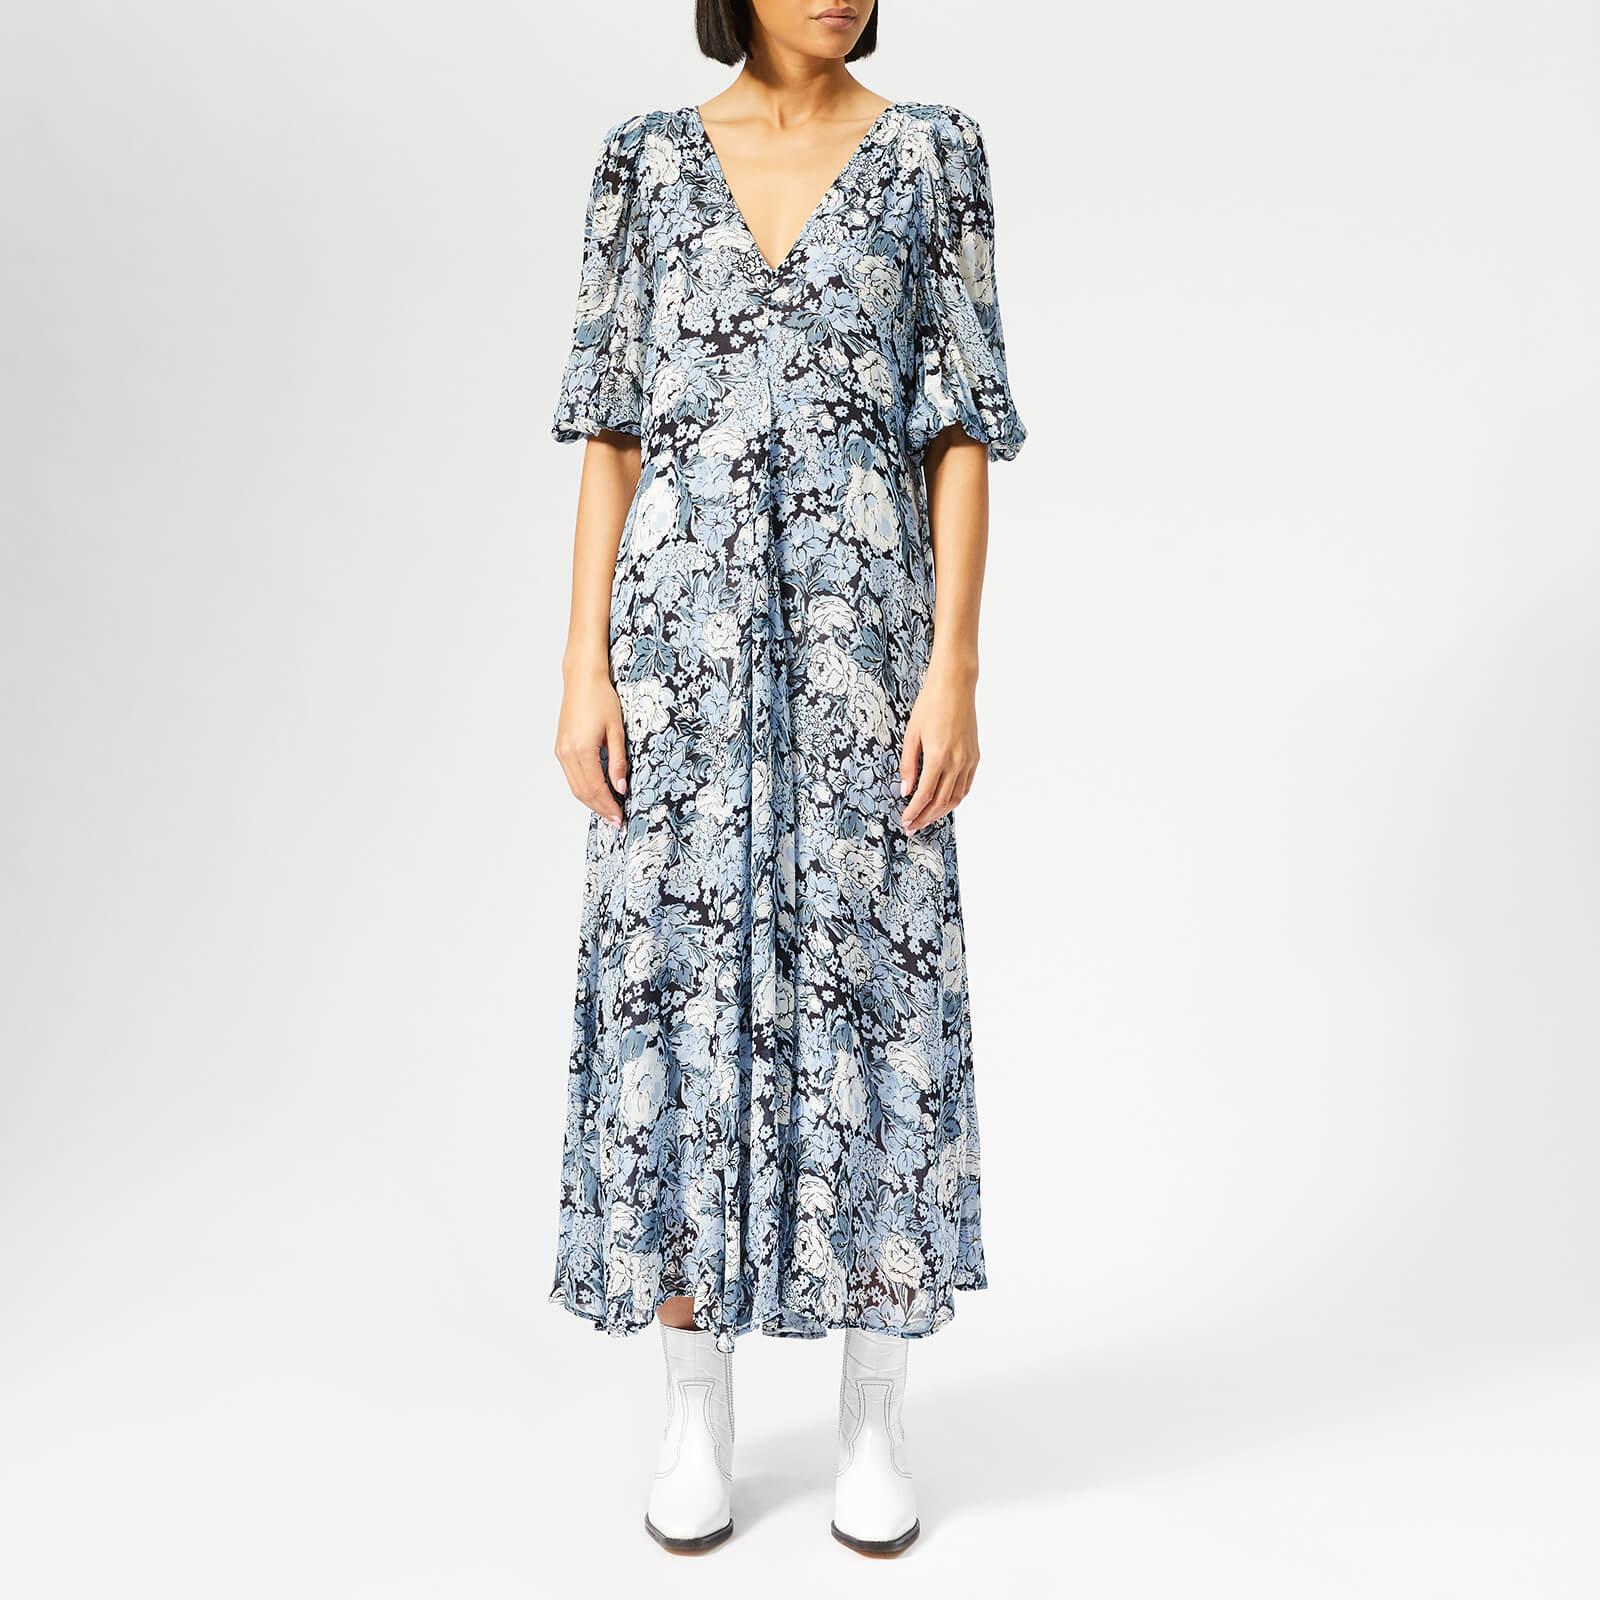 21cd59127ac Ganni Women's Elm Georgette Dress - Heather - Free UK Delivery over £50